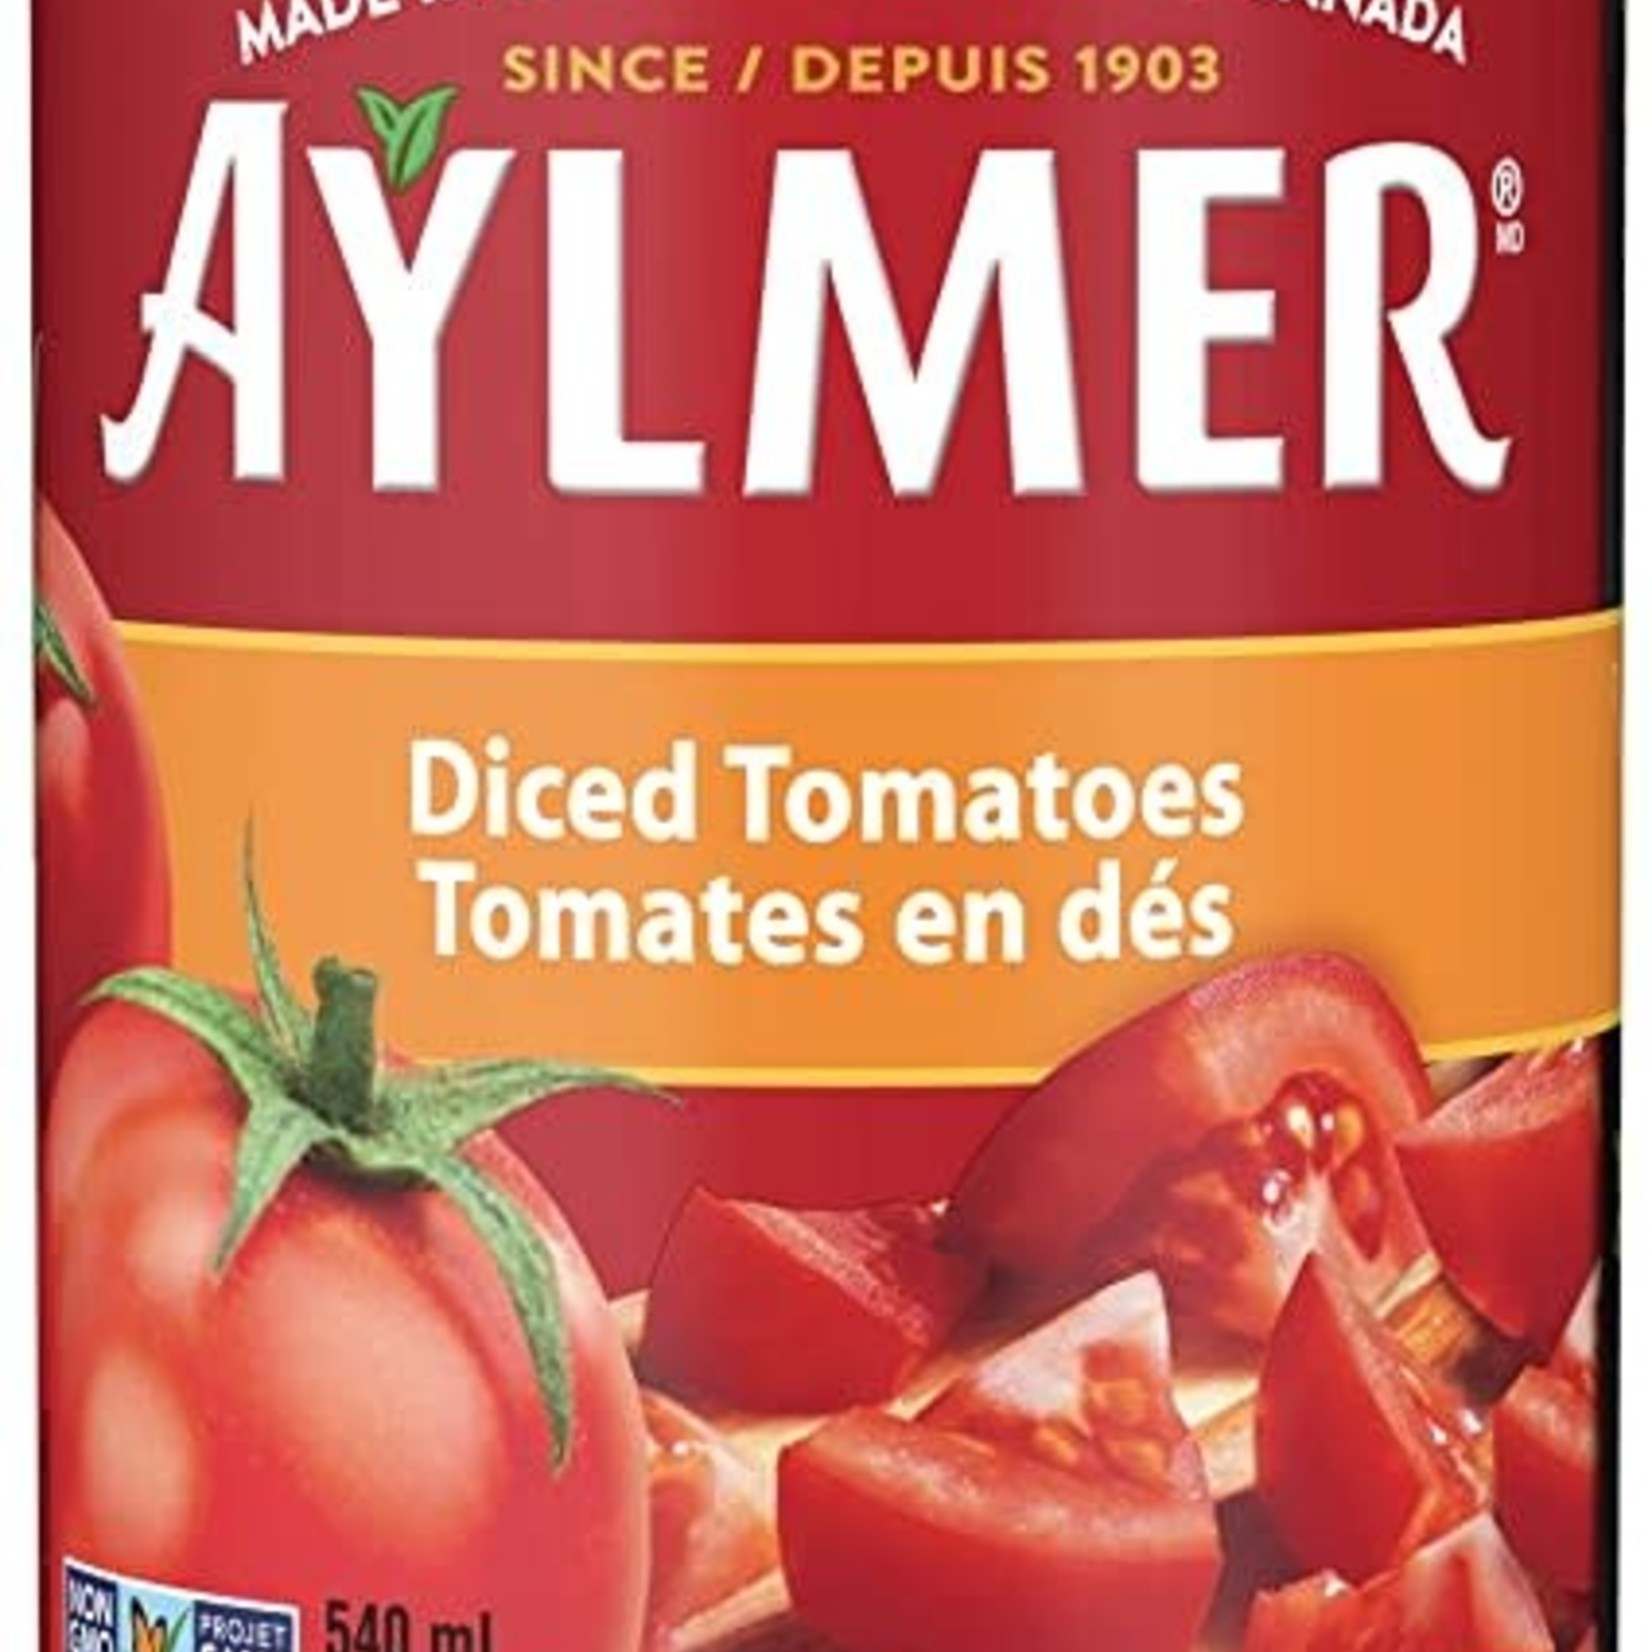 Aylmer Diced Tomatoes 540ml